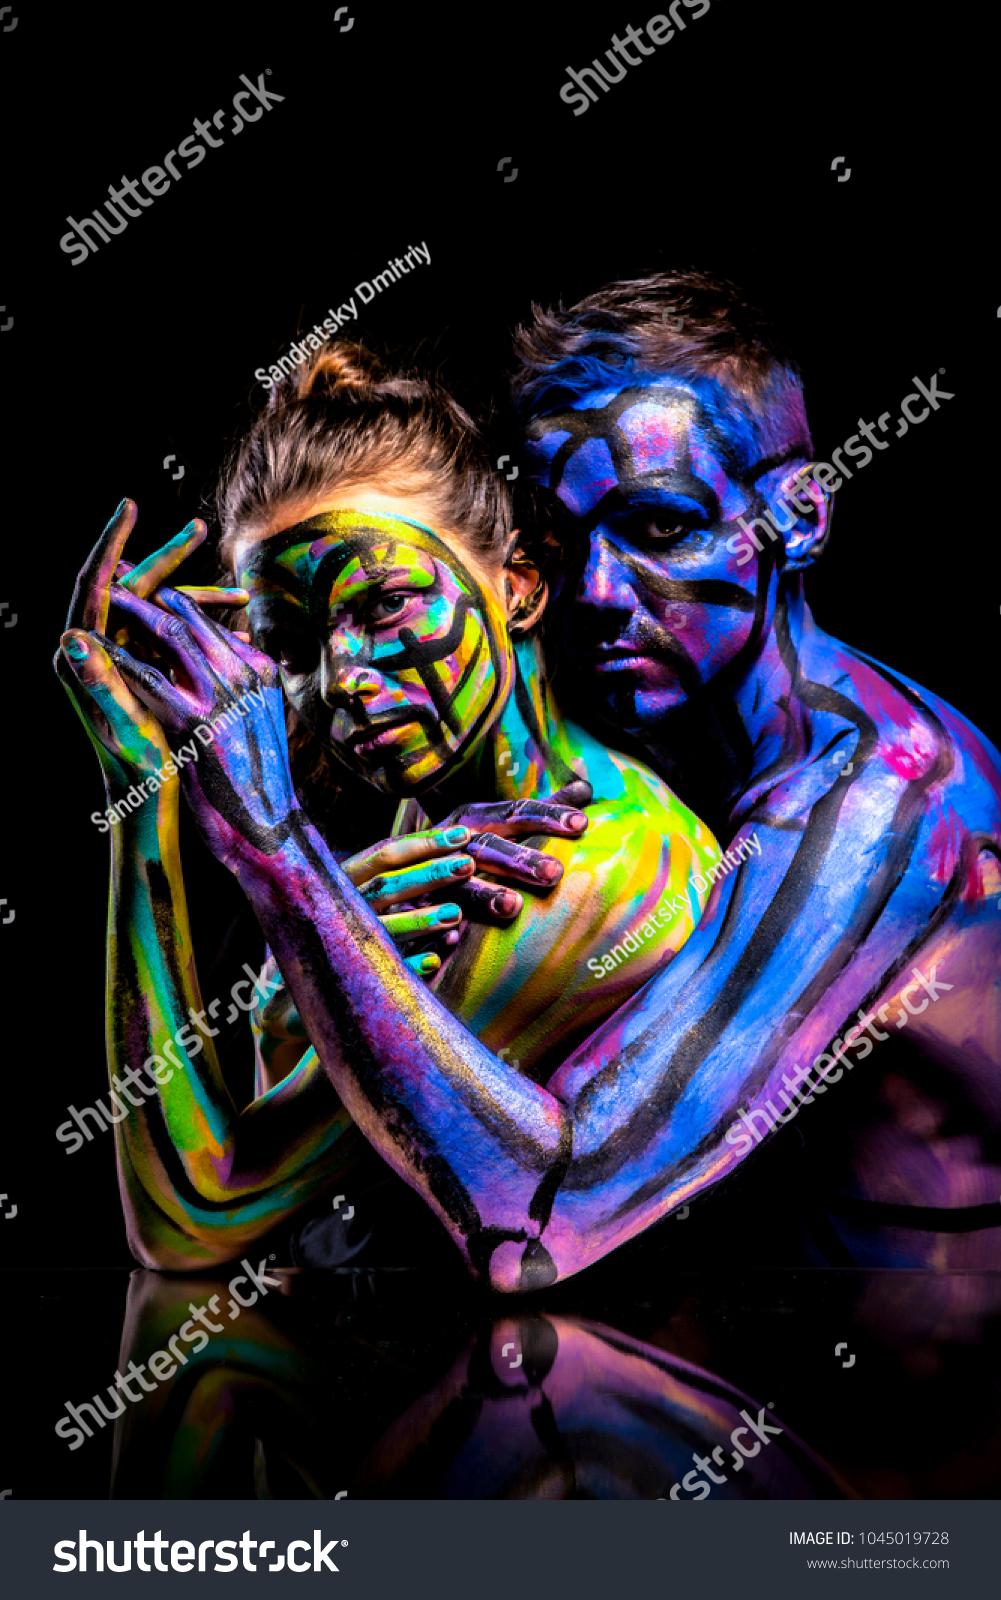 Lovers Couple Paint Abstract Art Portrait Stock Photo Edit Now 1045019728